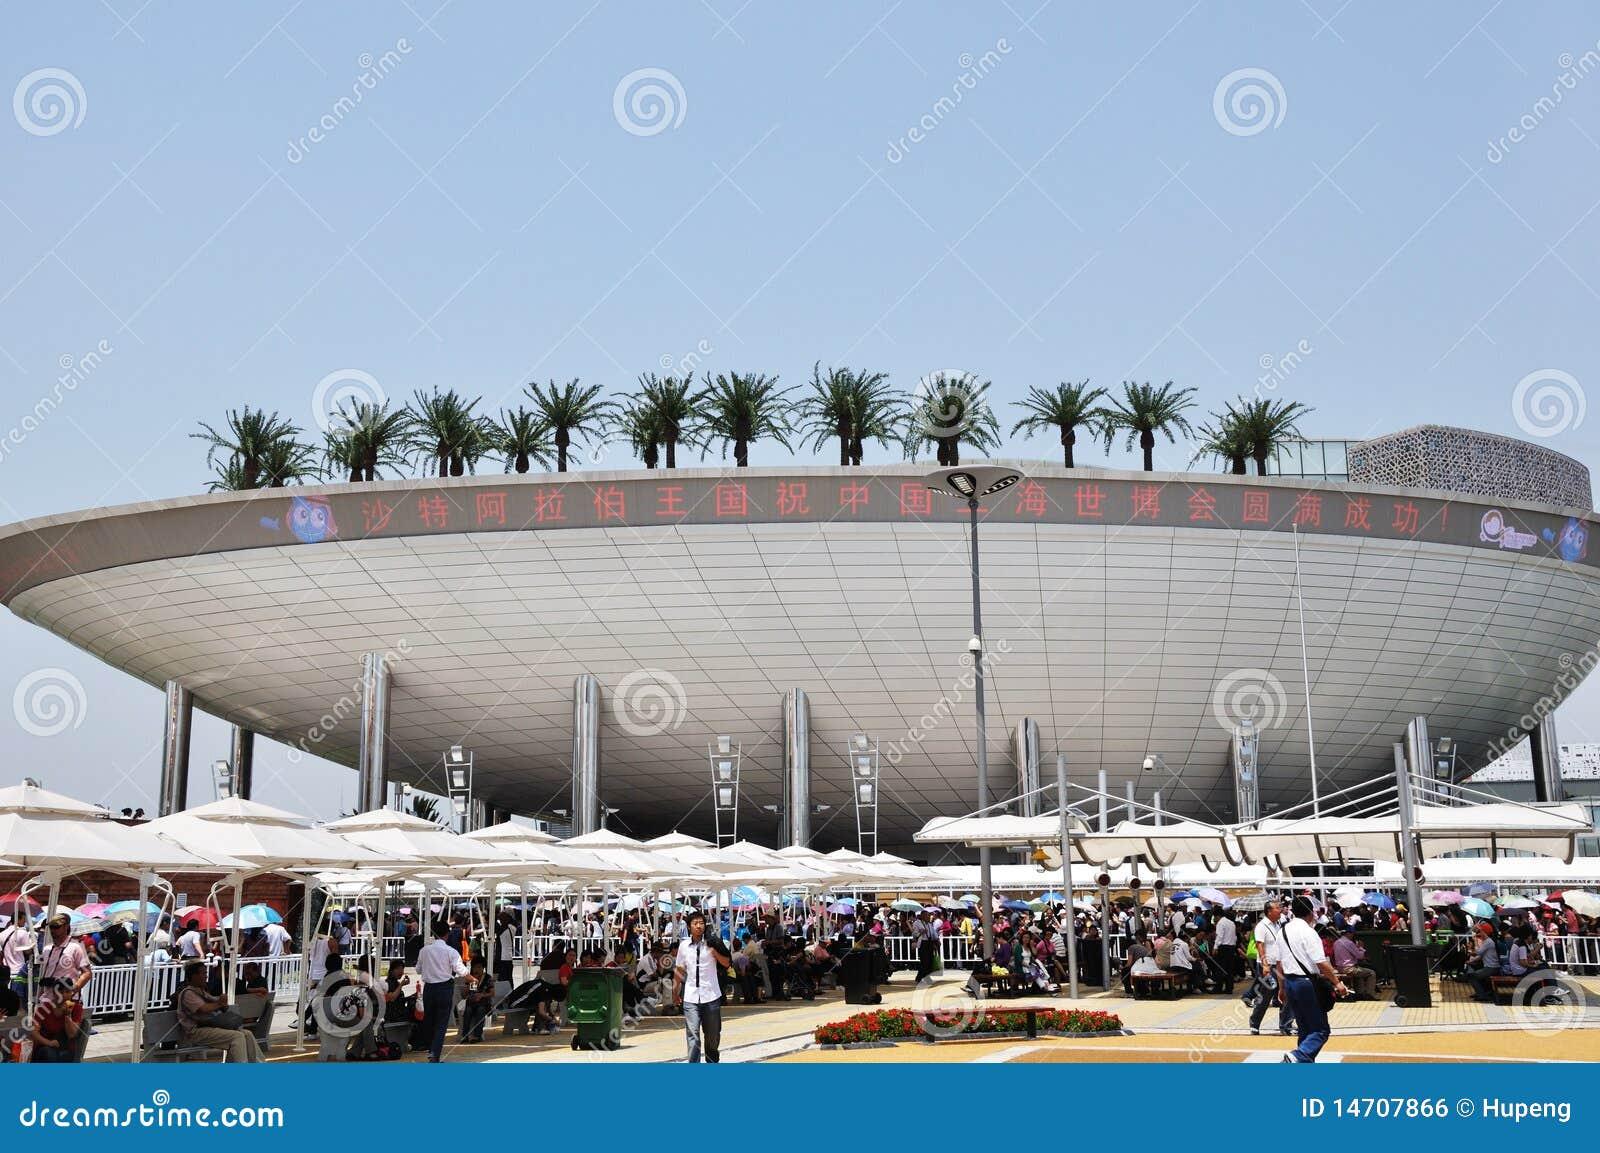 2010 shanghai expo saudi arabia pavilion editorial photo for Expo 2010 pavilions